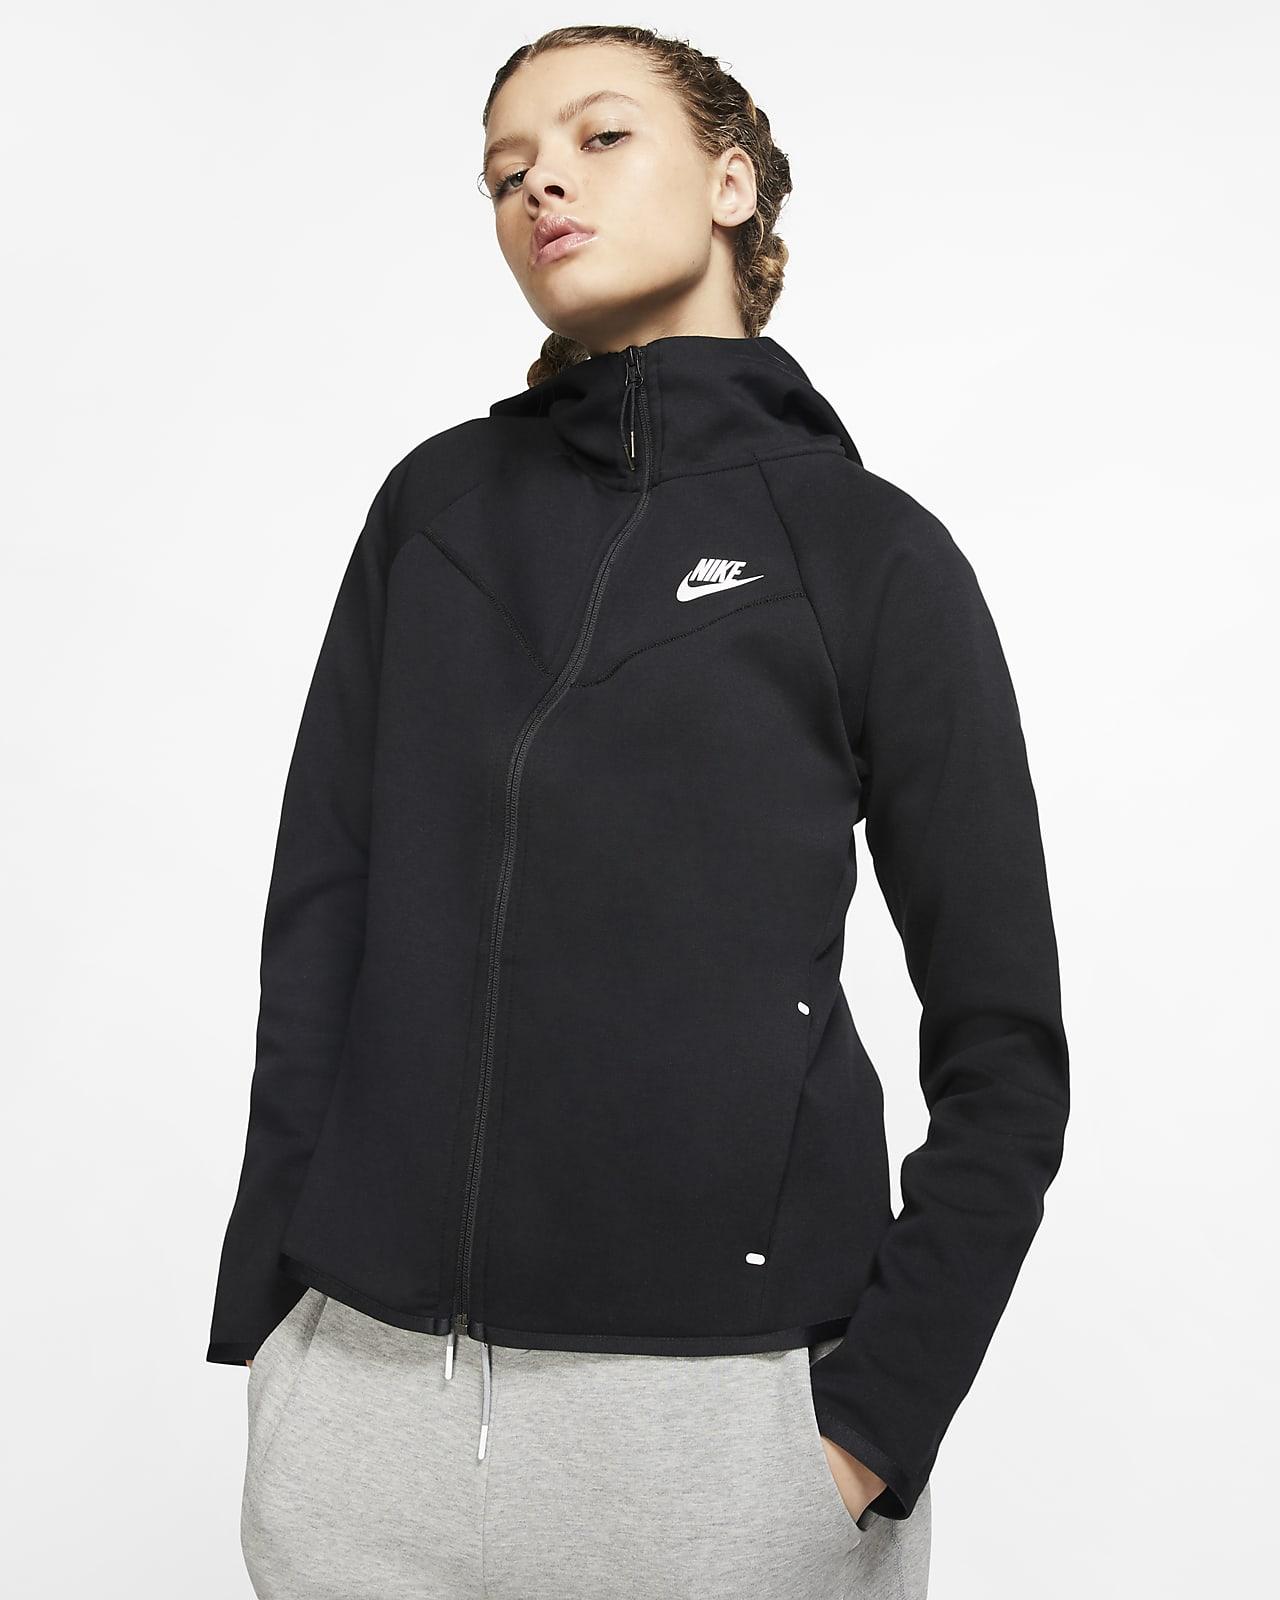 Nike Sportswear Windrunner Tech Fleece Hoodie met rits voor dames